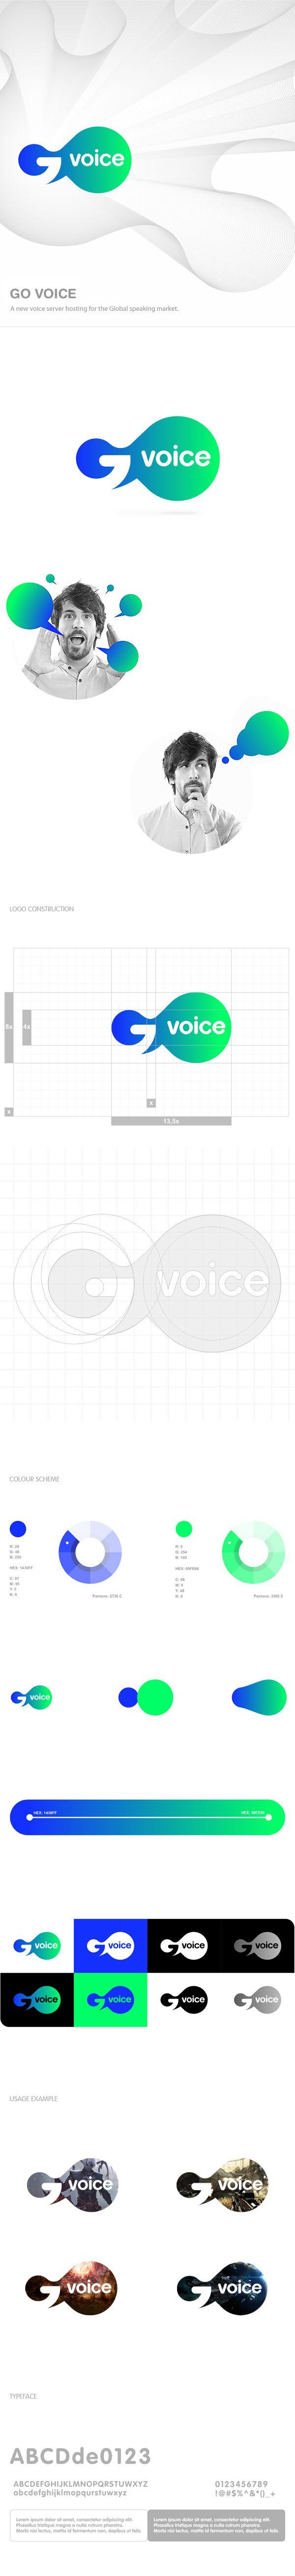 Go Voice by Fuse Collective , via Behance